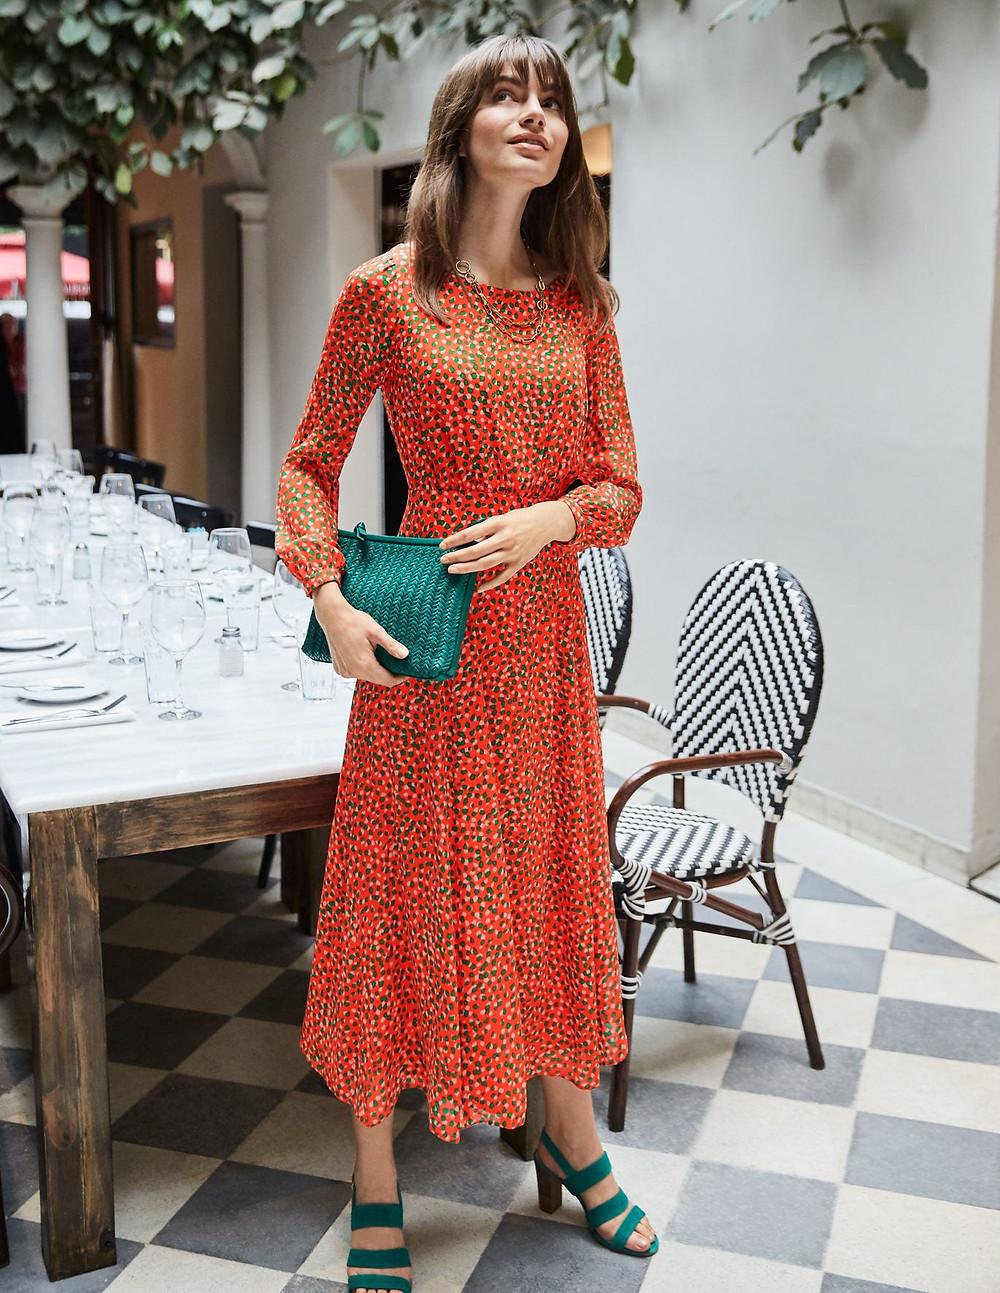 Orange Print Dress,my savvy fashion picks for autumn winter 2020, the image tree blog